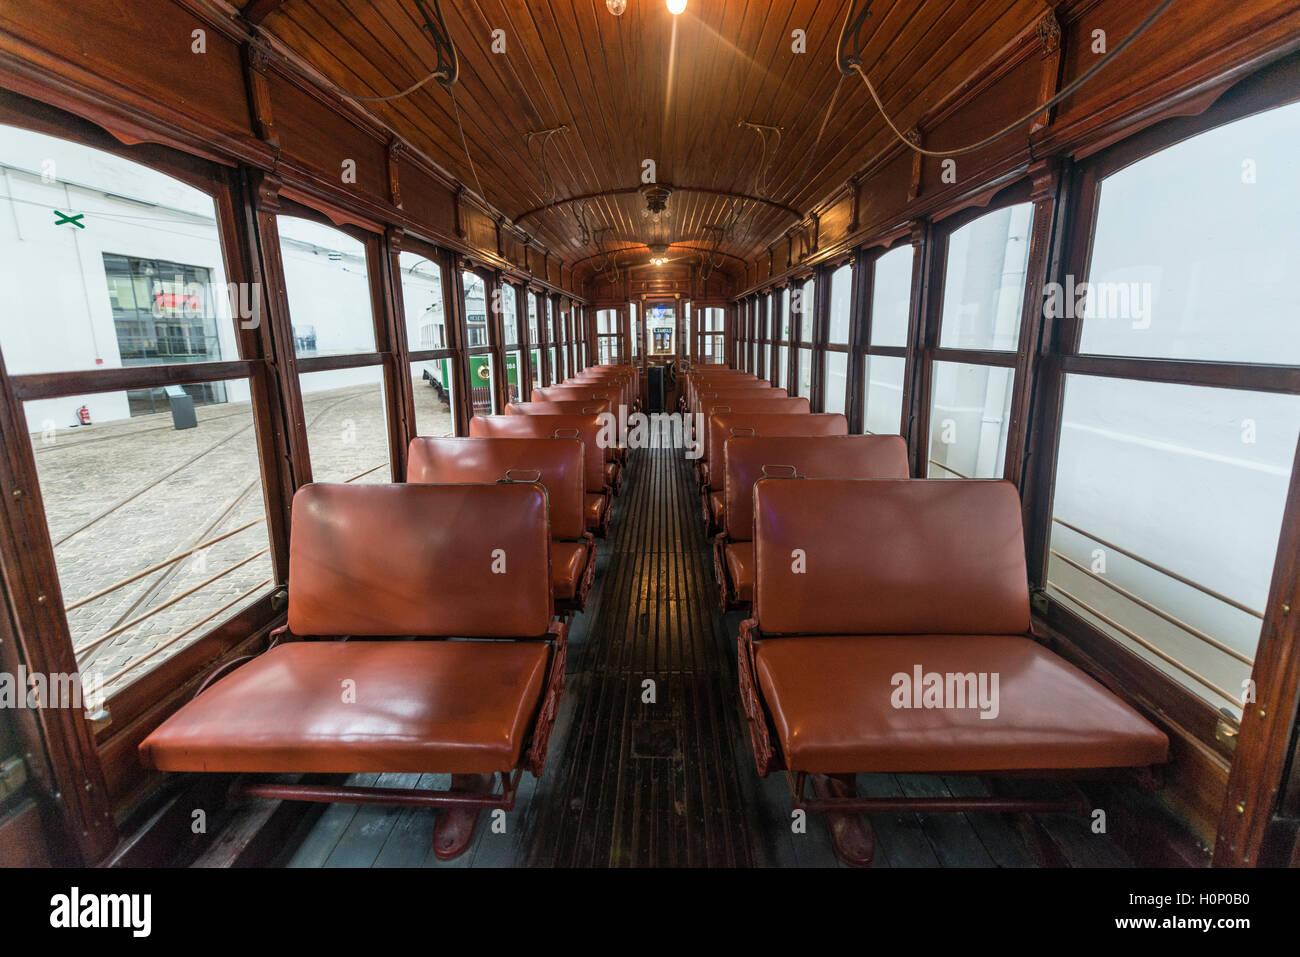 Vista interior del tranvía, el museo del tranvía, Museu do carro Electrico da Cidade do Porto, Porto, Imagen De Stock